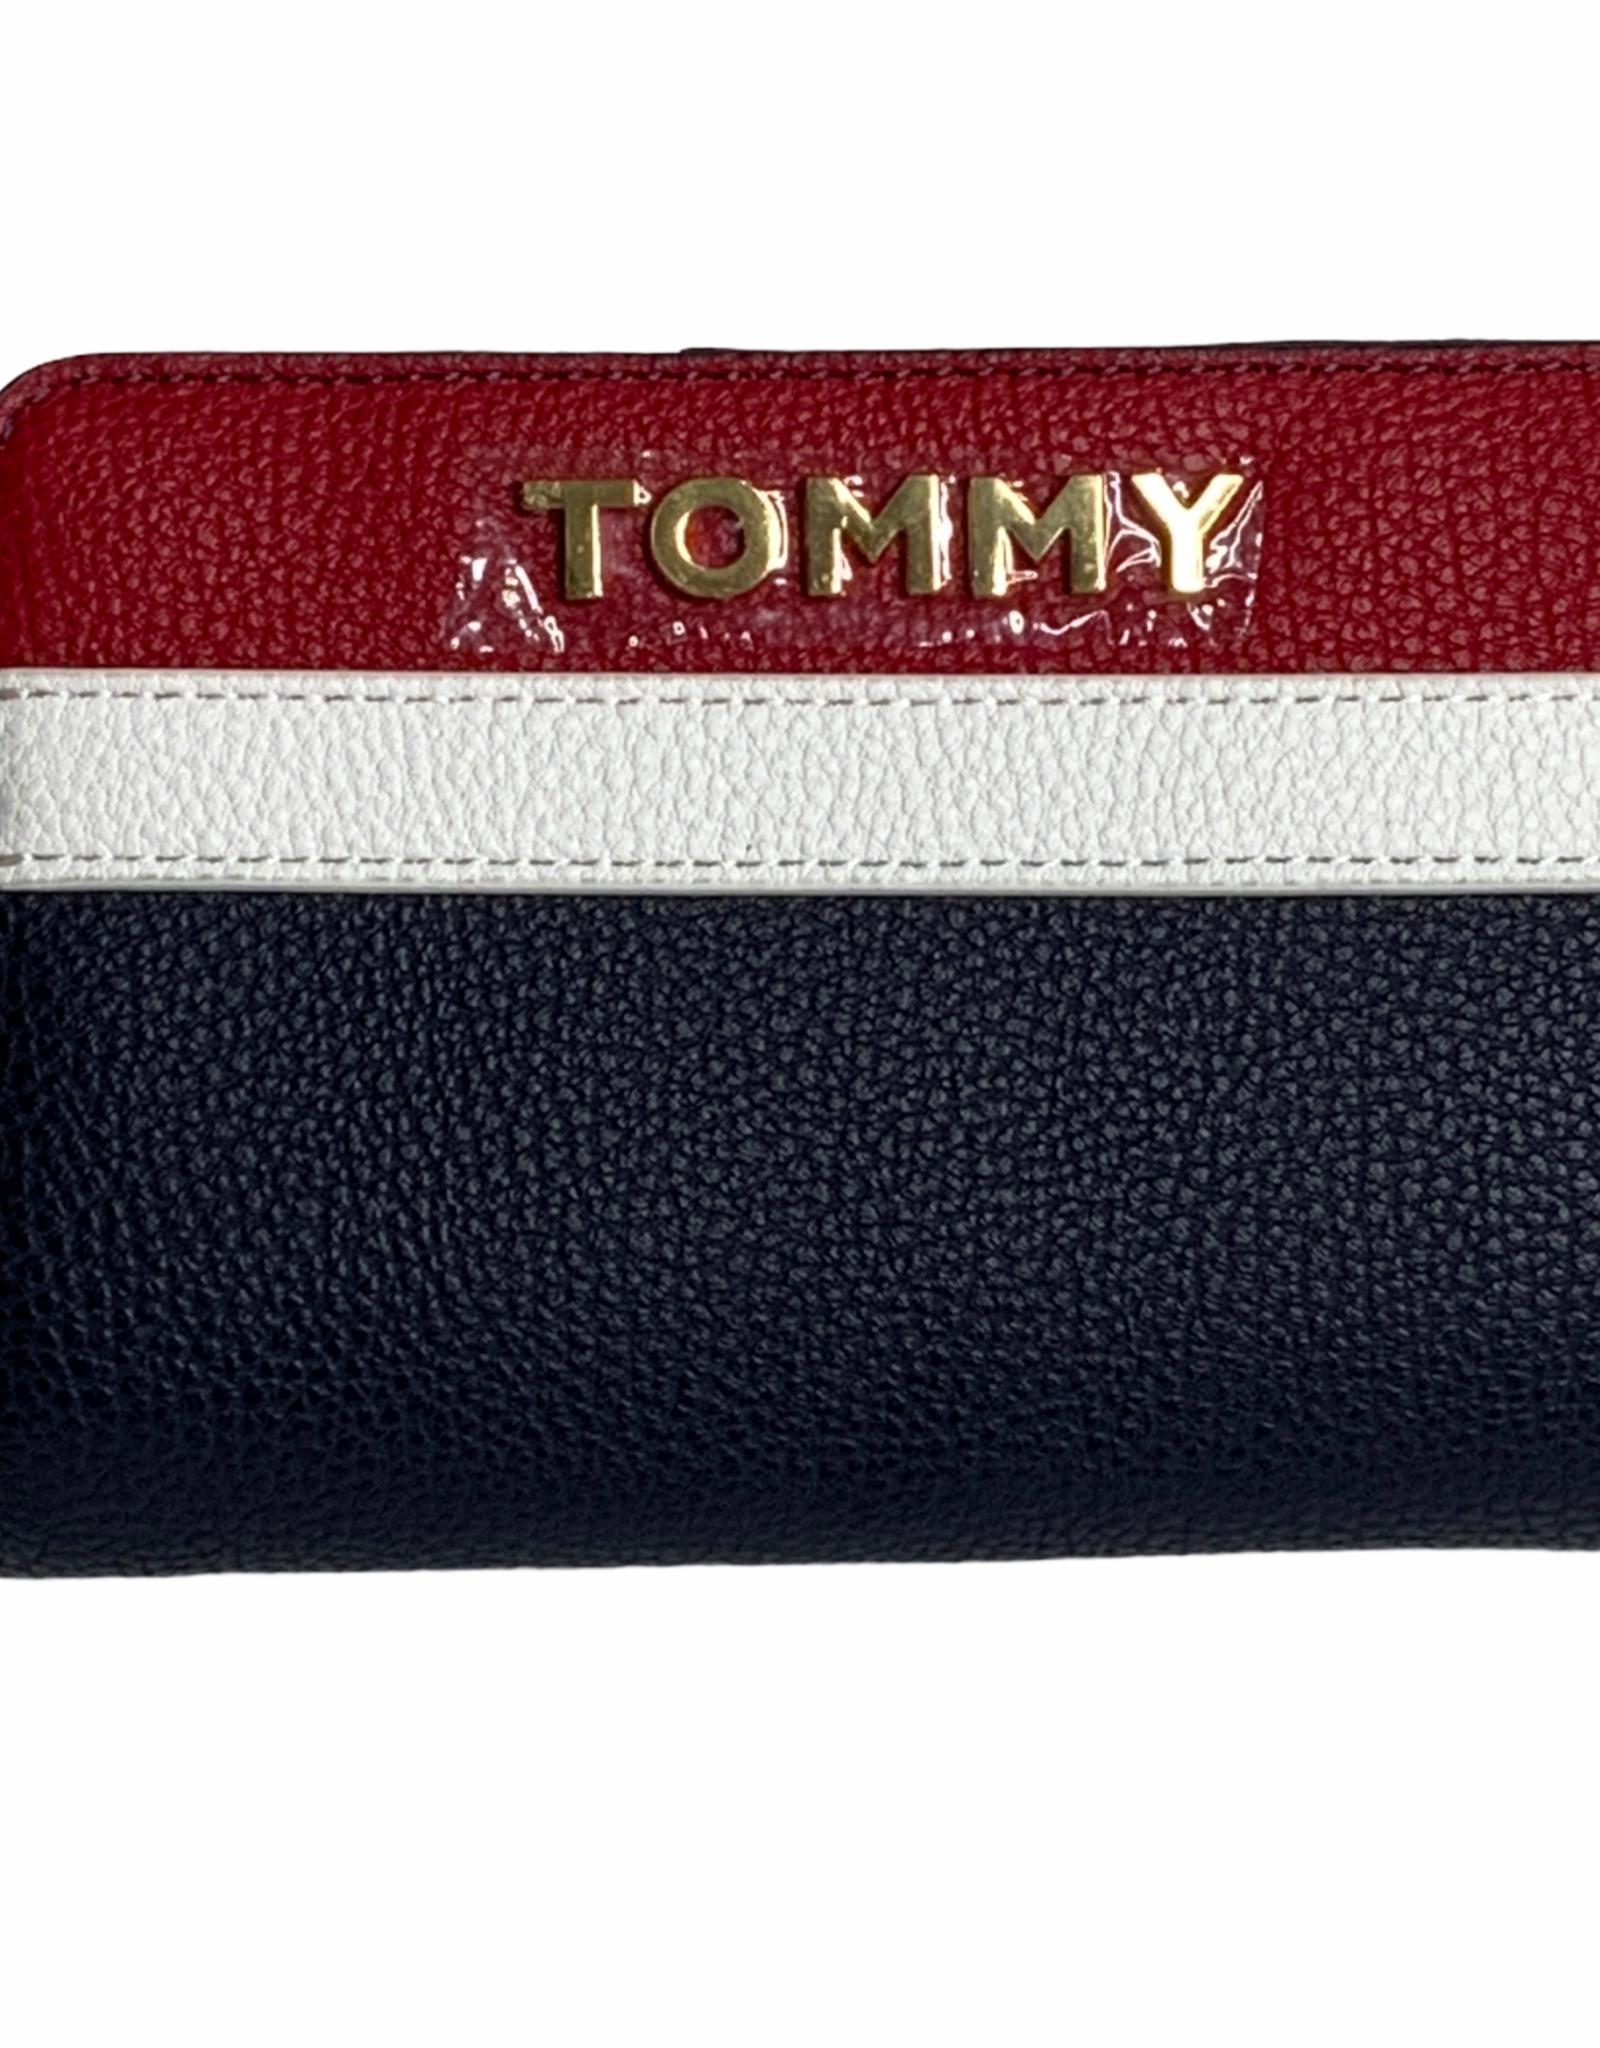 Tommy Hilfiger Tommy Hilfiger Half Zip Wallet Card Holder & Coin Purse